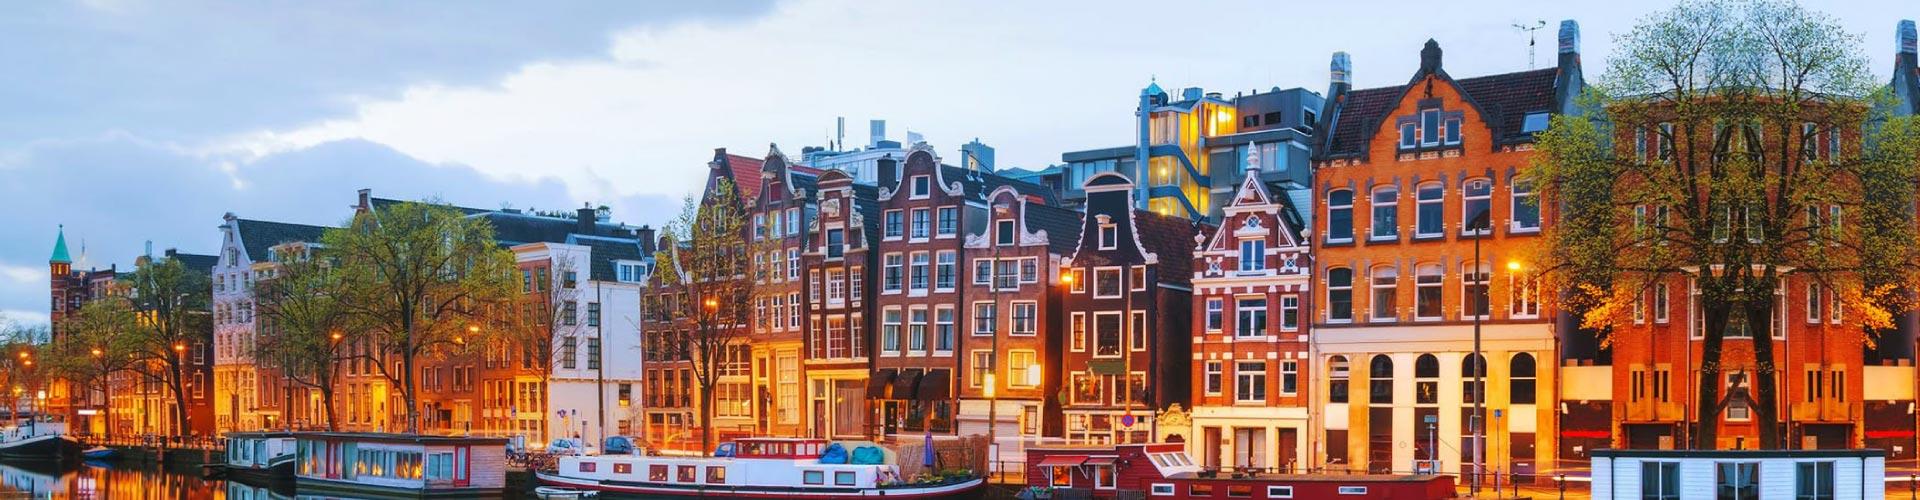 Enchanting Moselle - Amsterdam Roundtrip (Crystal Cruise)